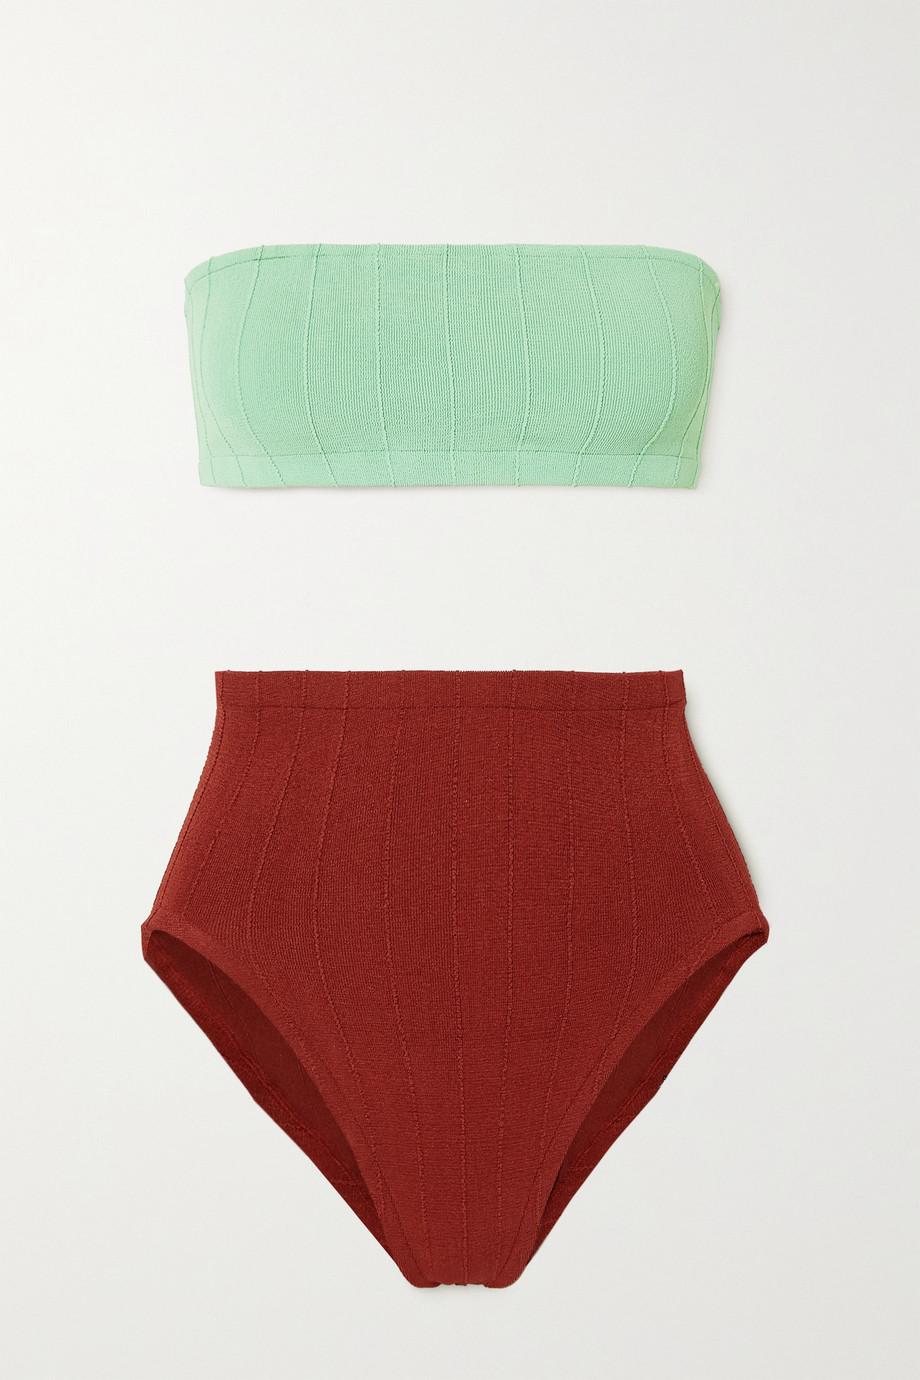 Hunza G + NET SUSTAIN Duo Edie Nile two-tone ribbed bikini